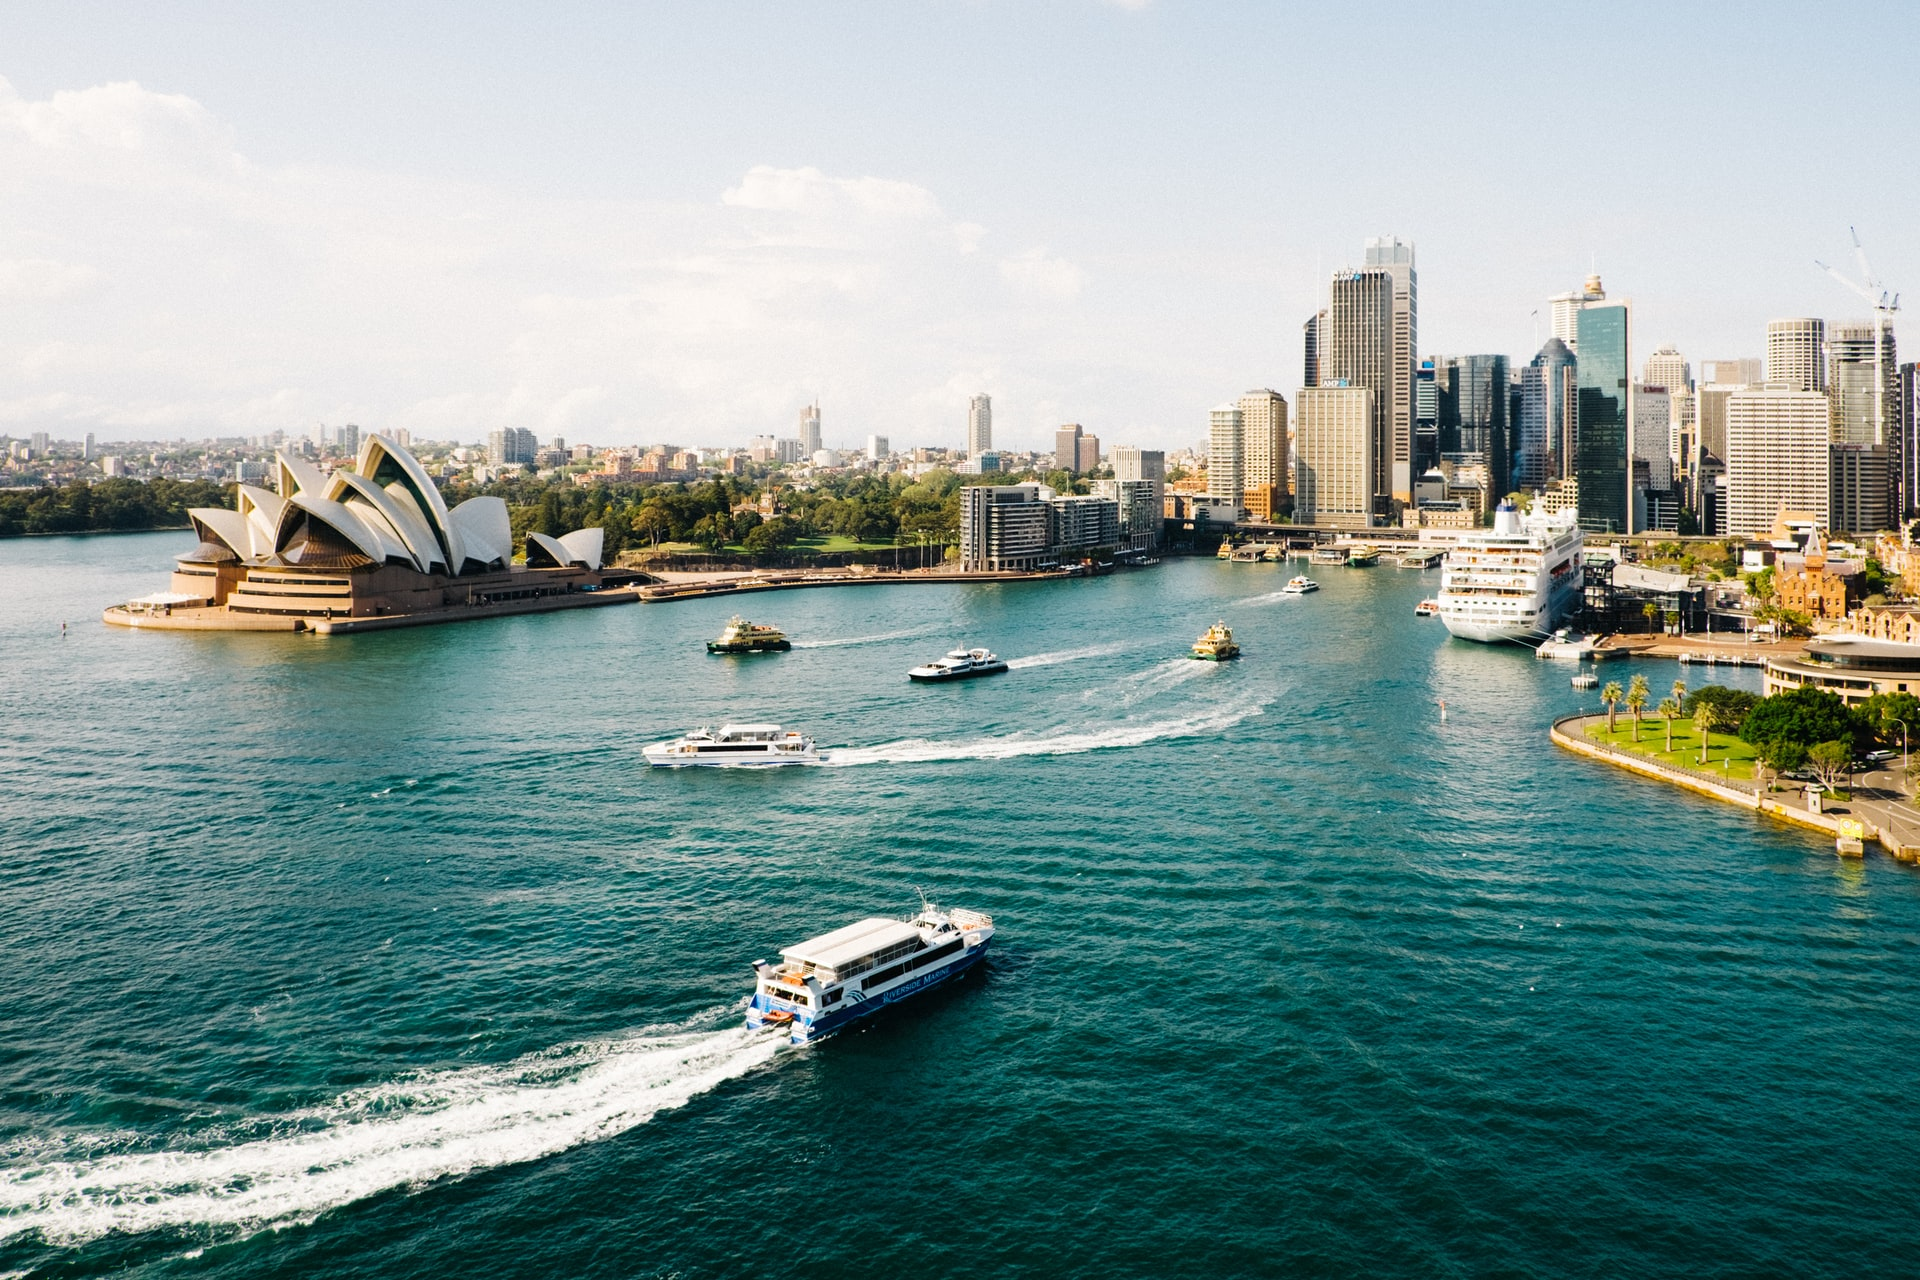 Gap Year Program - Australia & Indonesia Gap Semester | Pacific Discovery  7